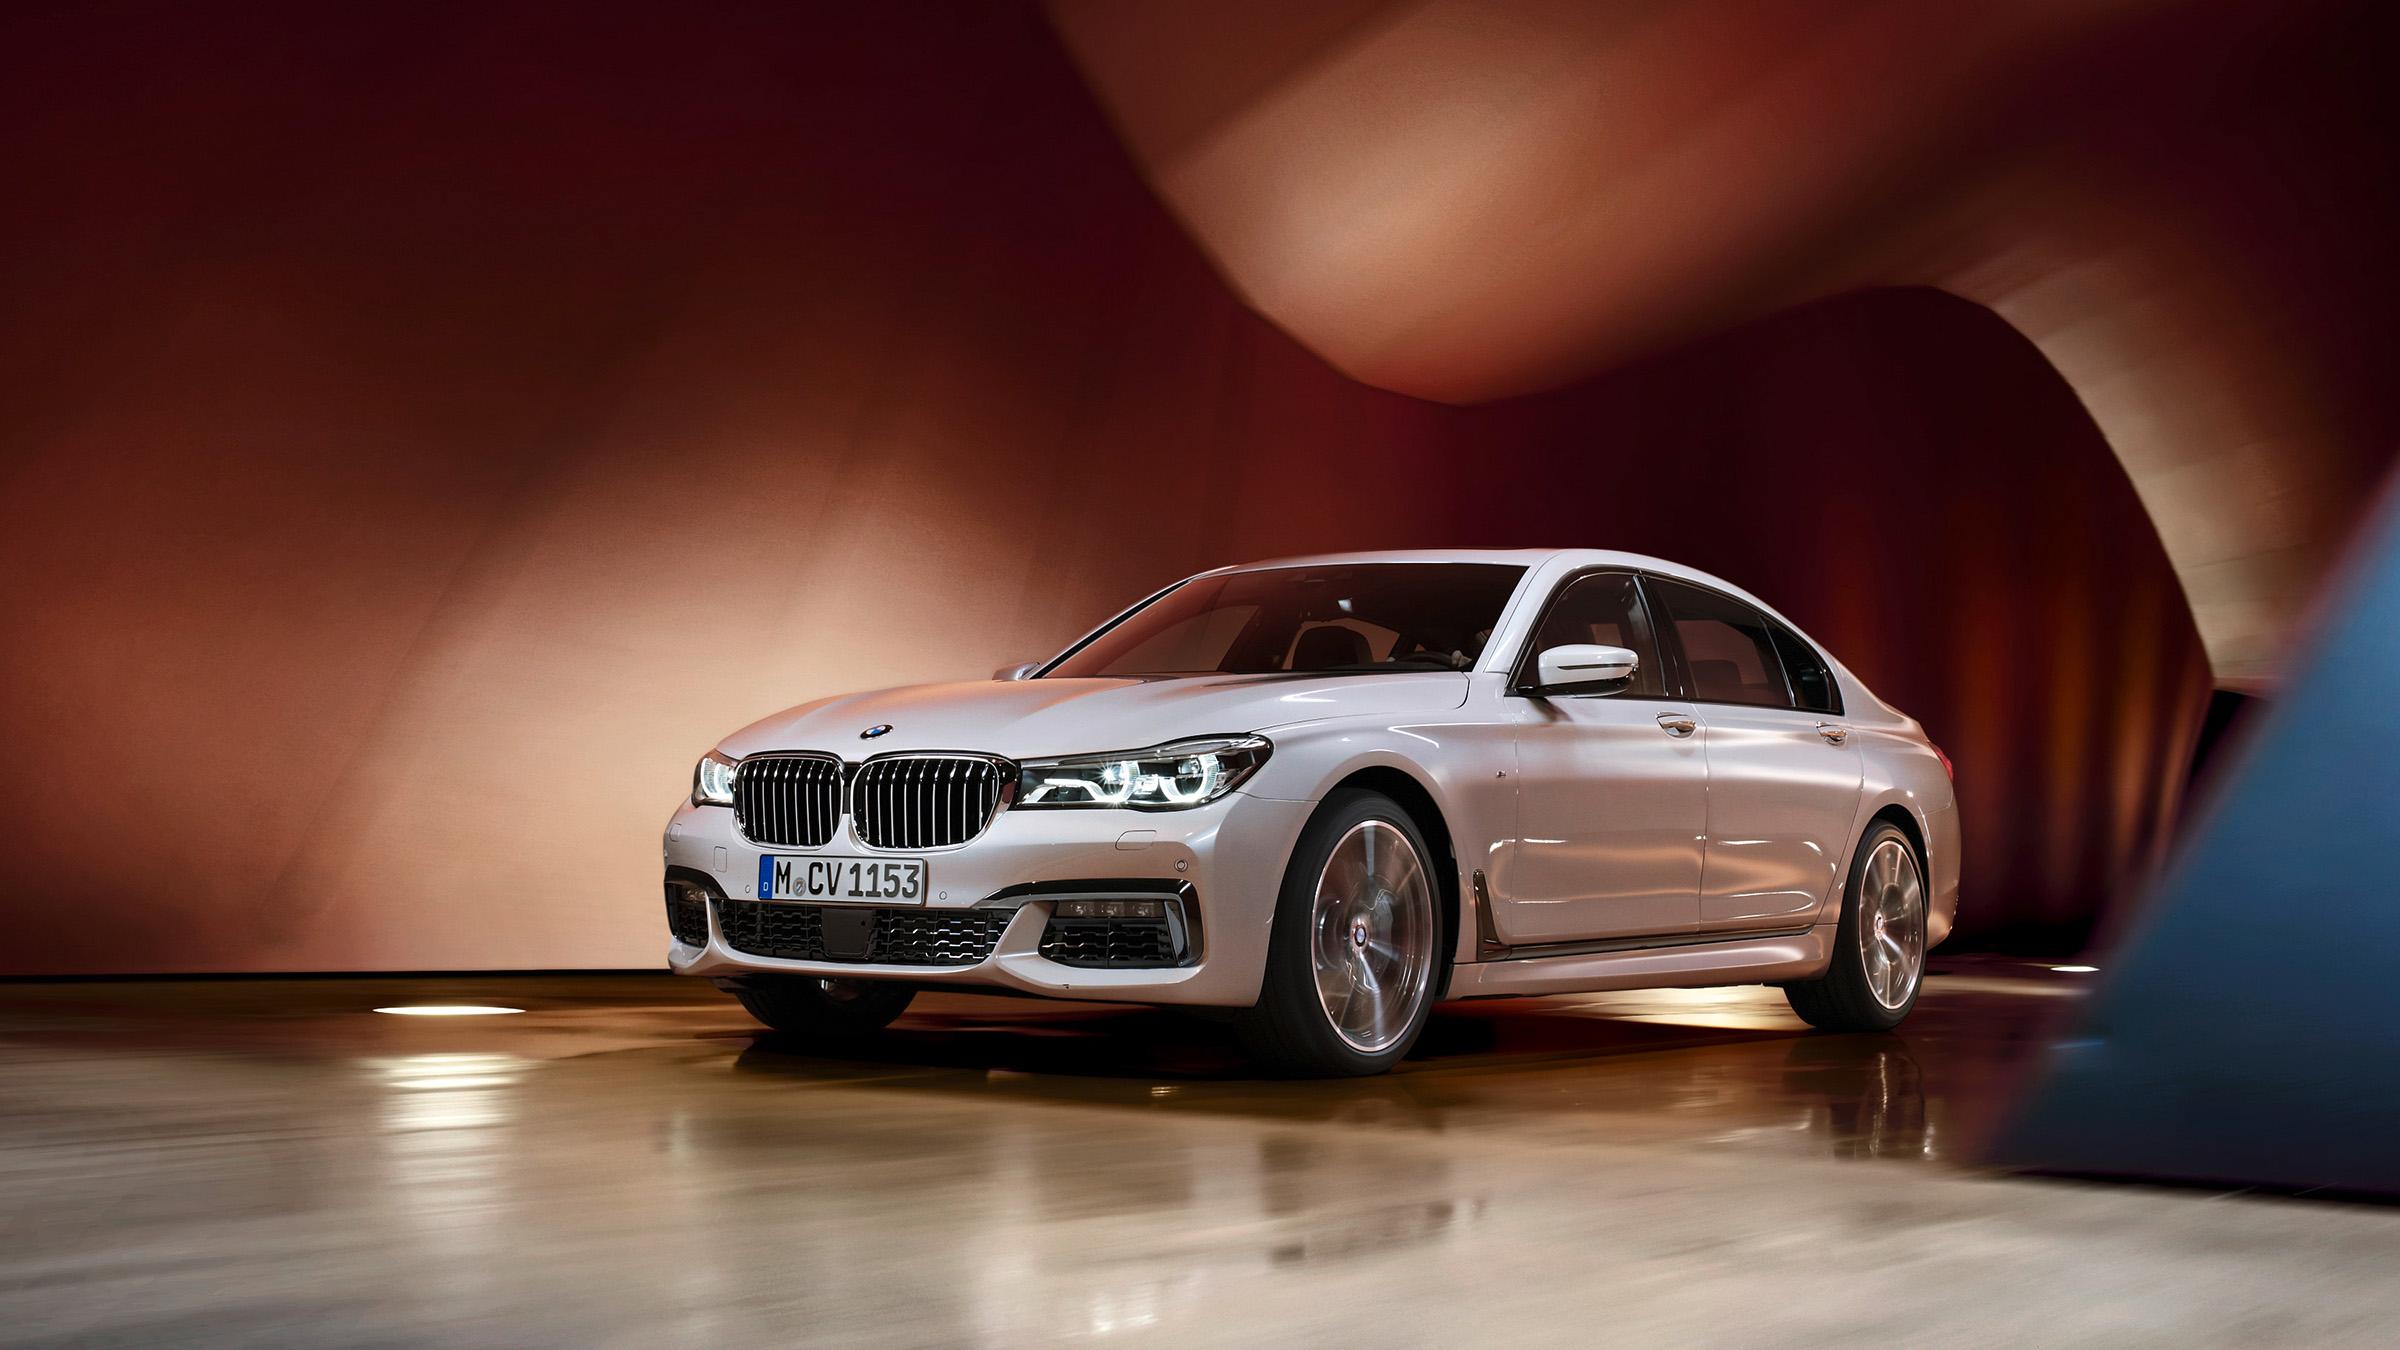 BMW_7ER_EMIR_HAVERIC_08_2400